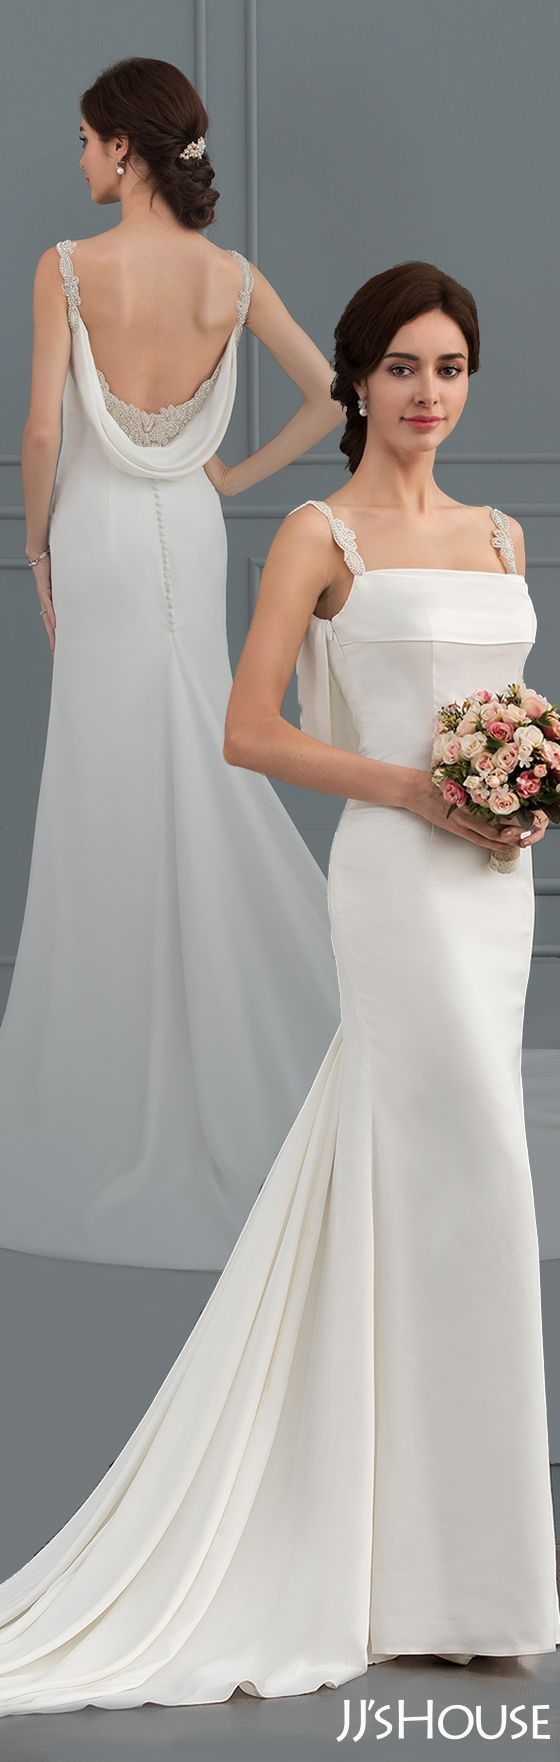 This mermaid wedding dress has perfect design and great fabric! #JJsHouse #Wedding